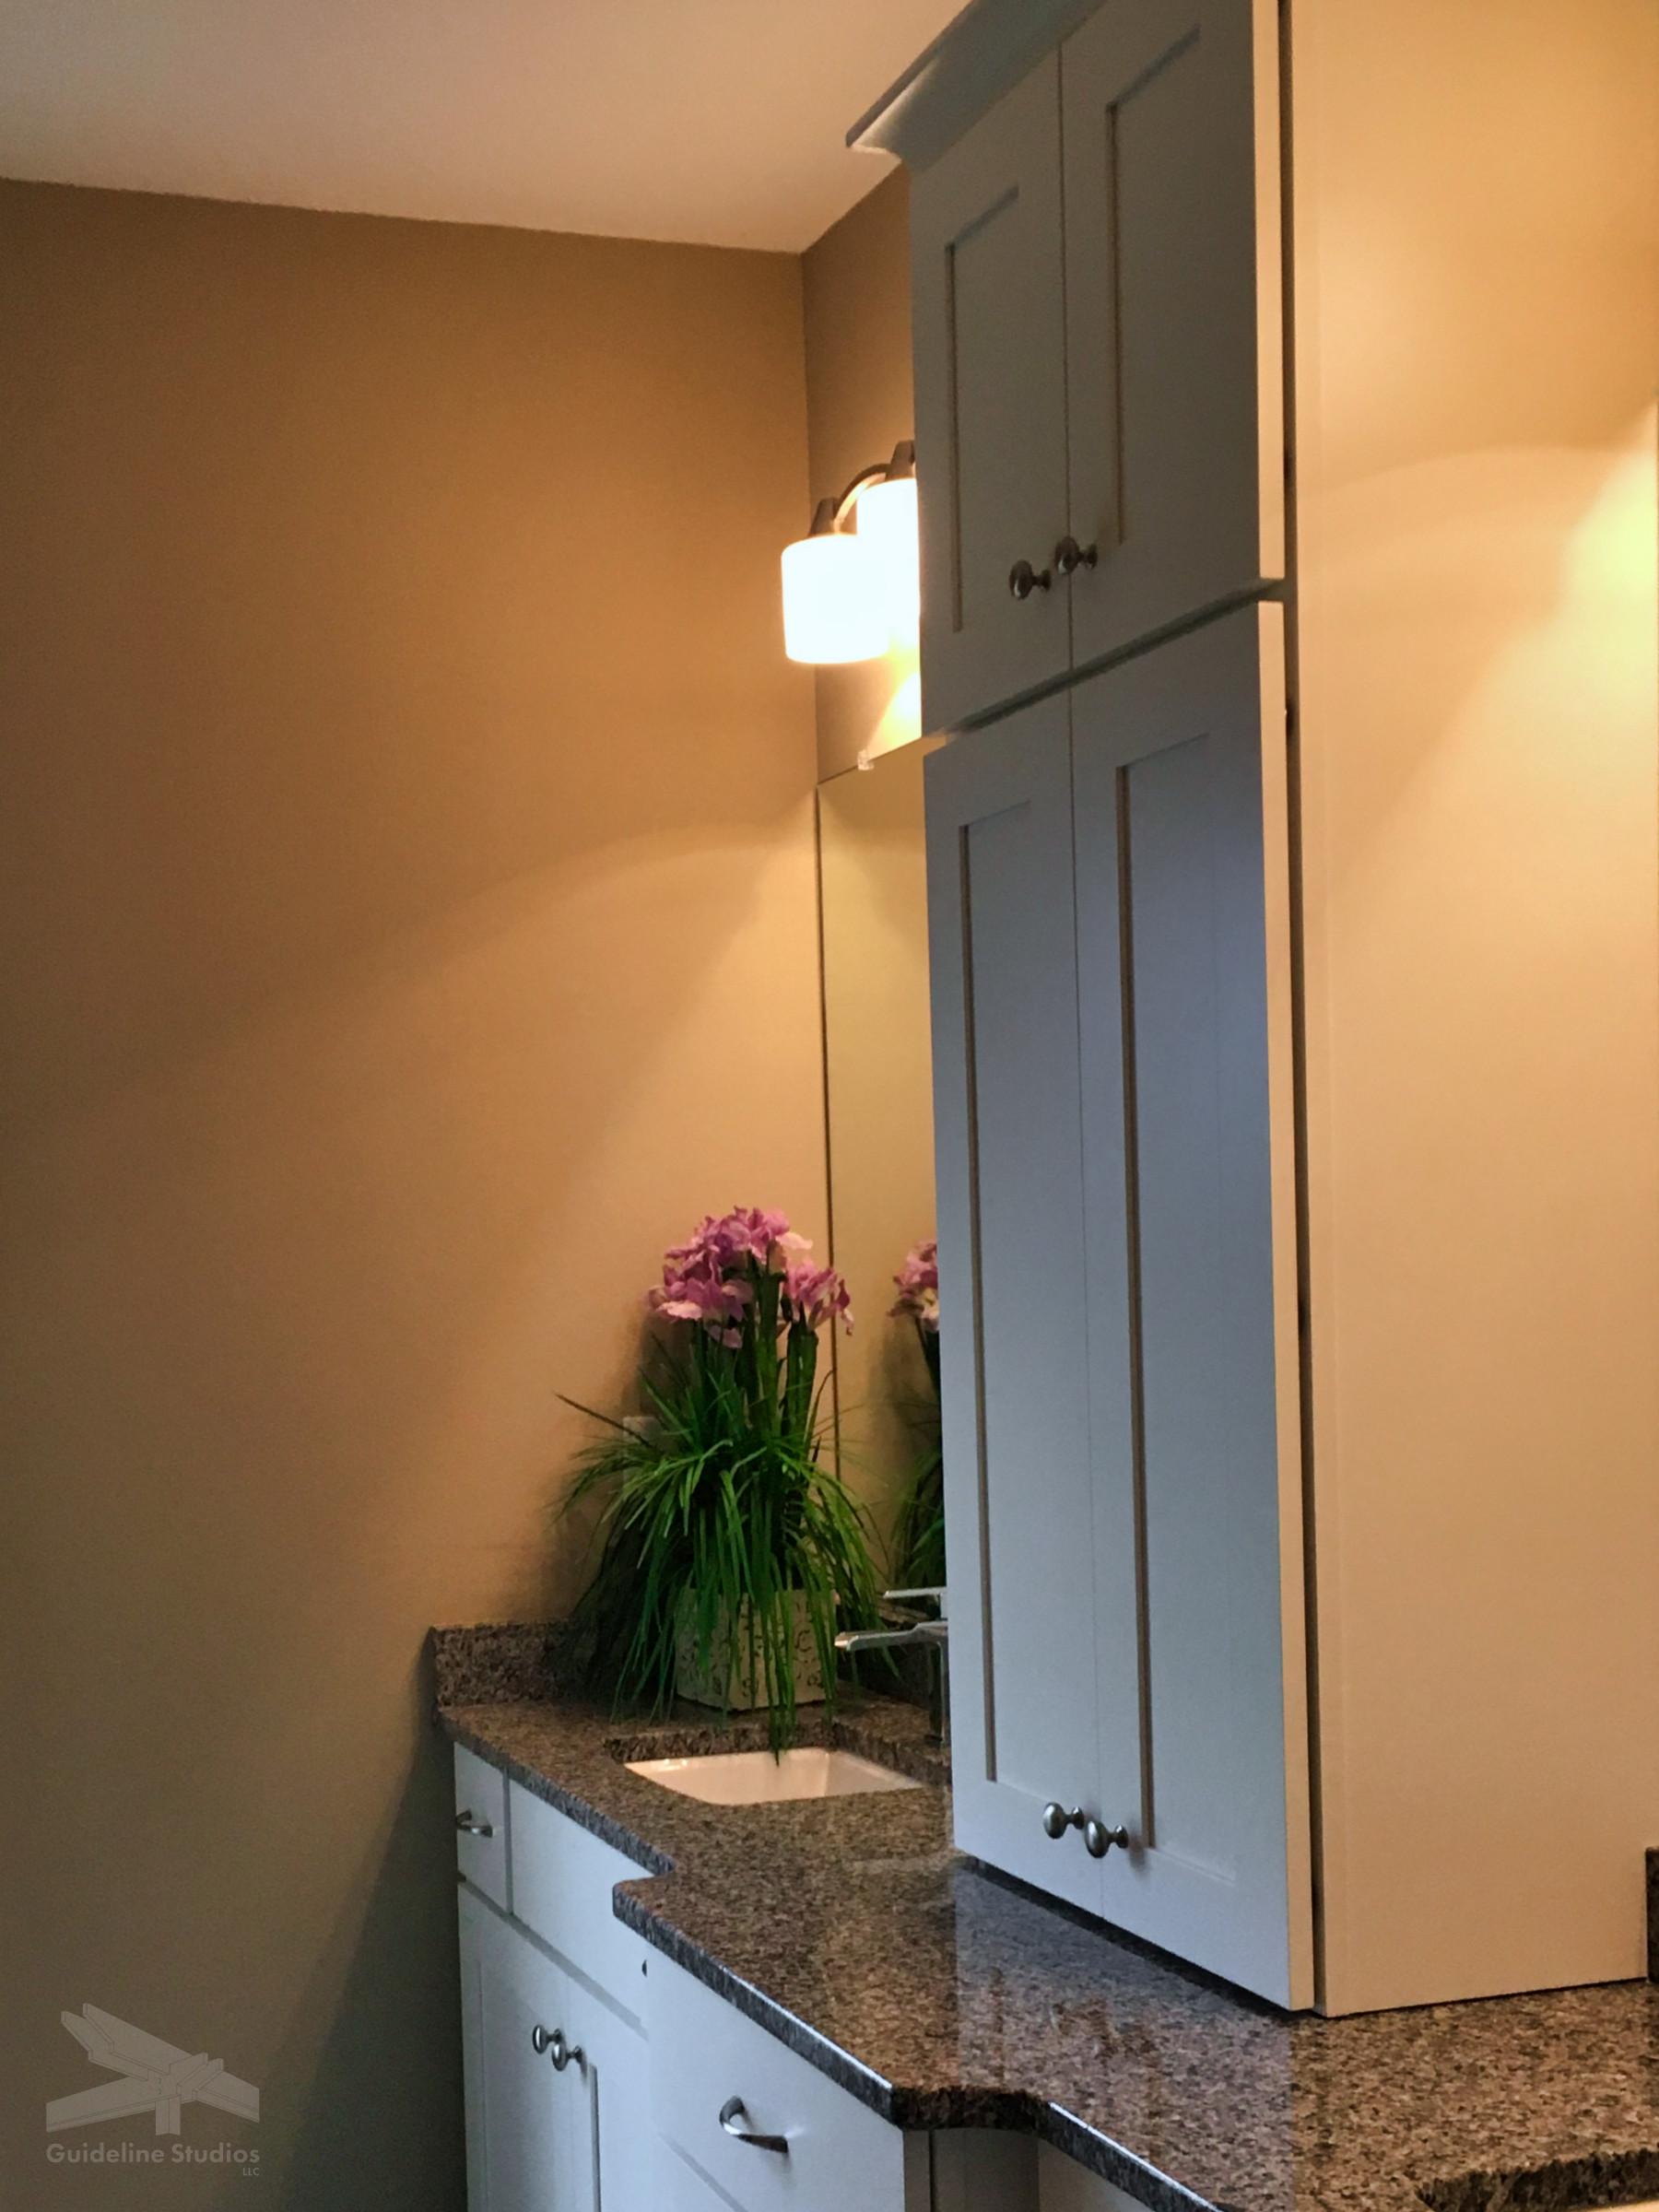 BBIII Master Bath Cabinets - Guideline Studios